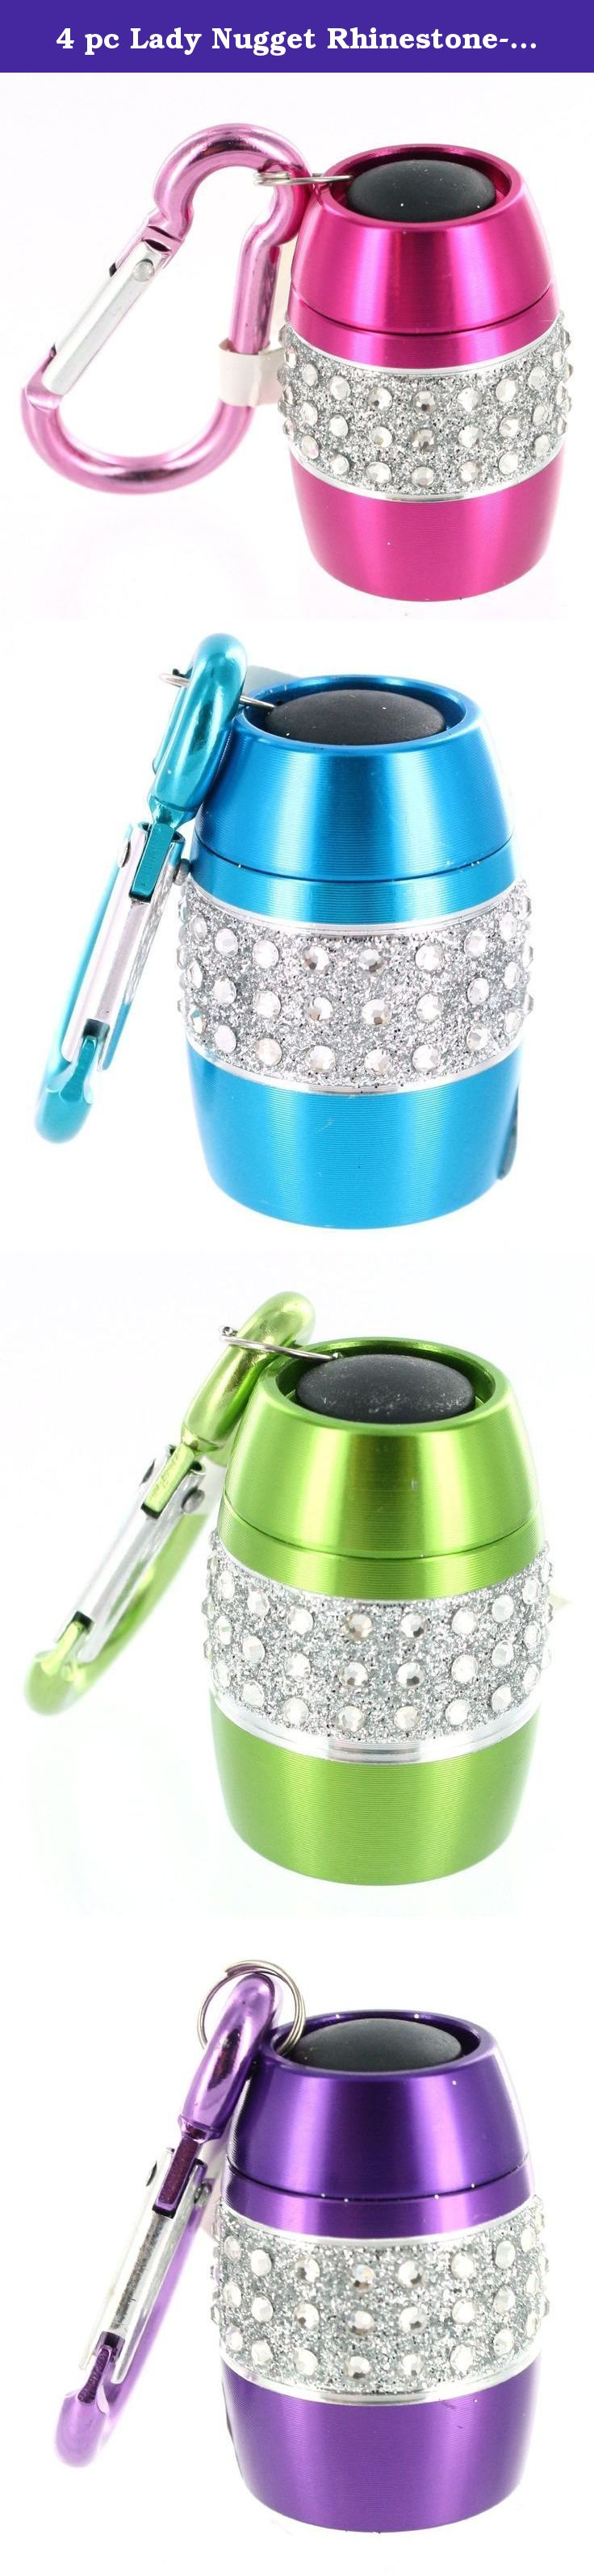 4 pc Lady Nugget RhinestoneEncrusted Mini Flashlight